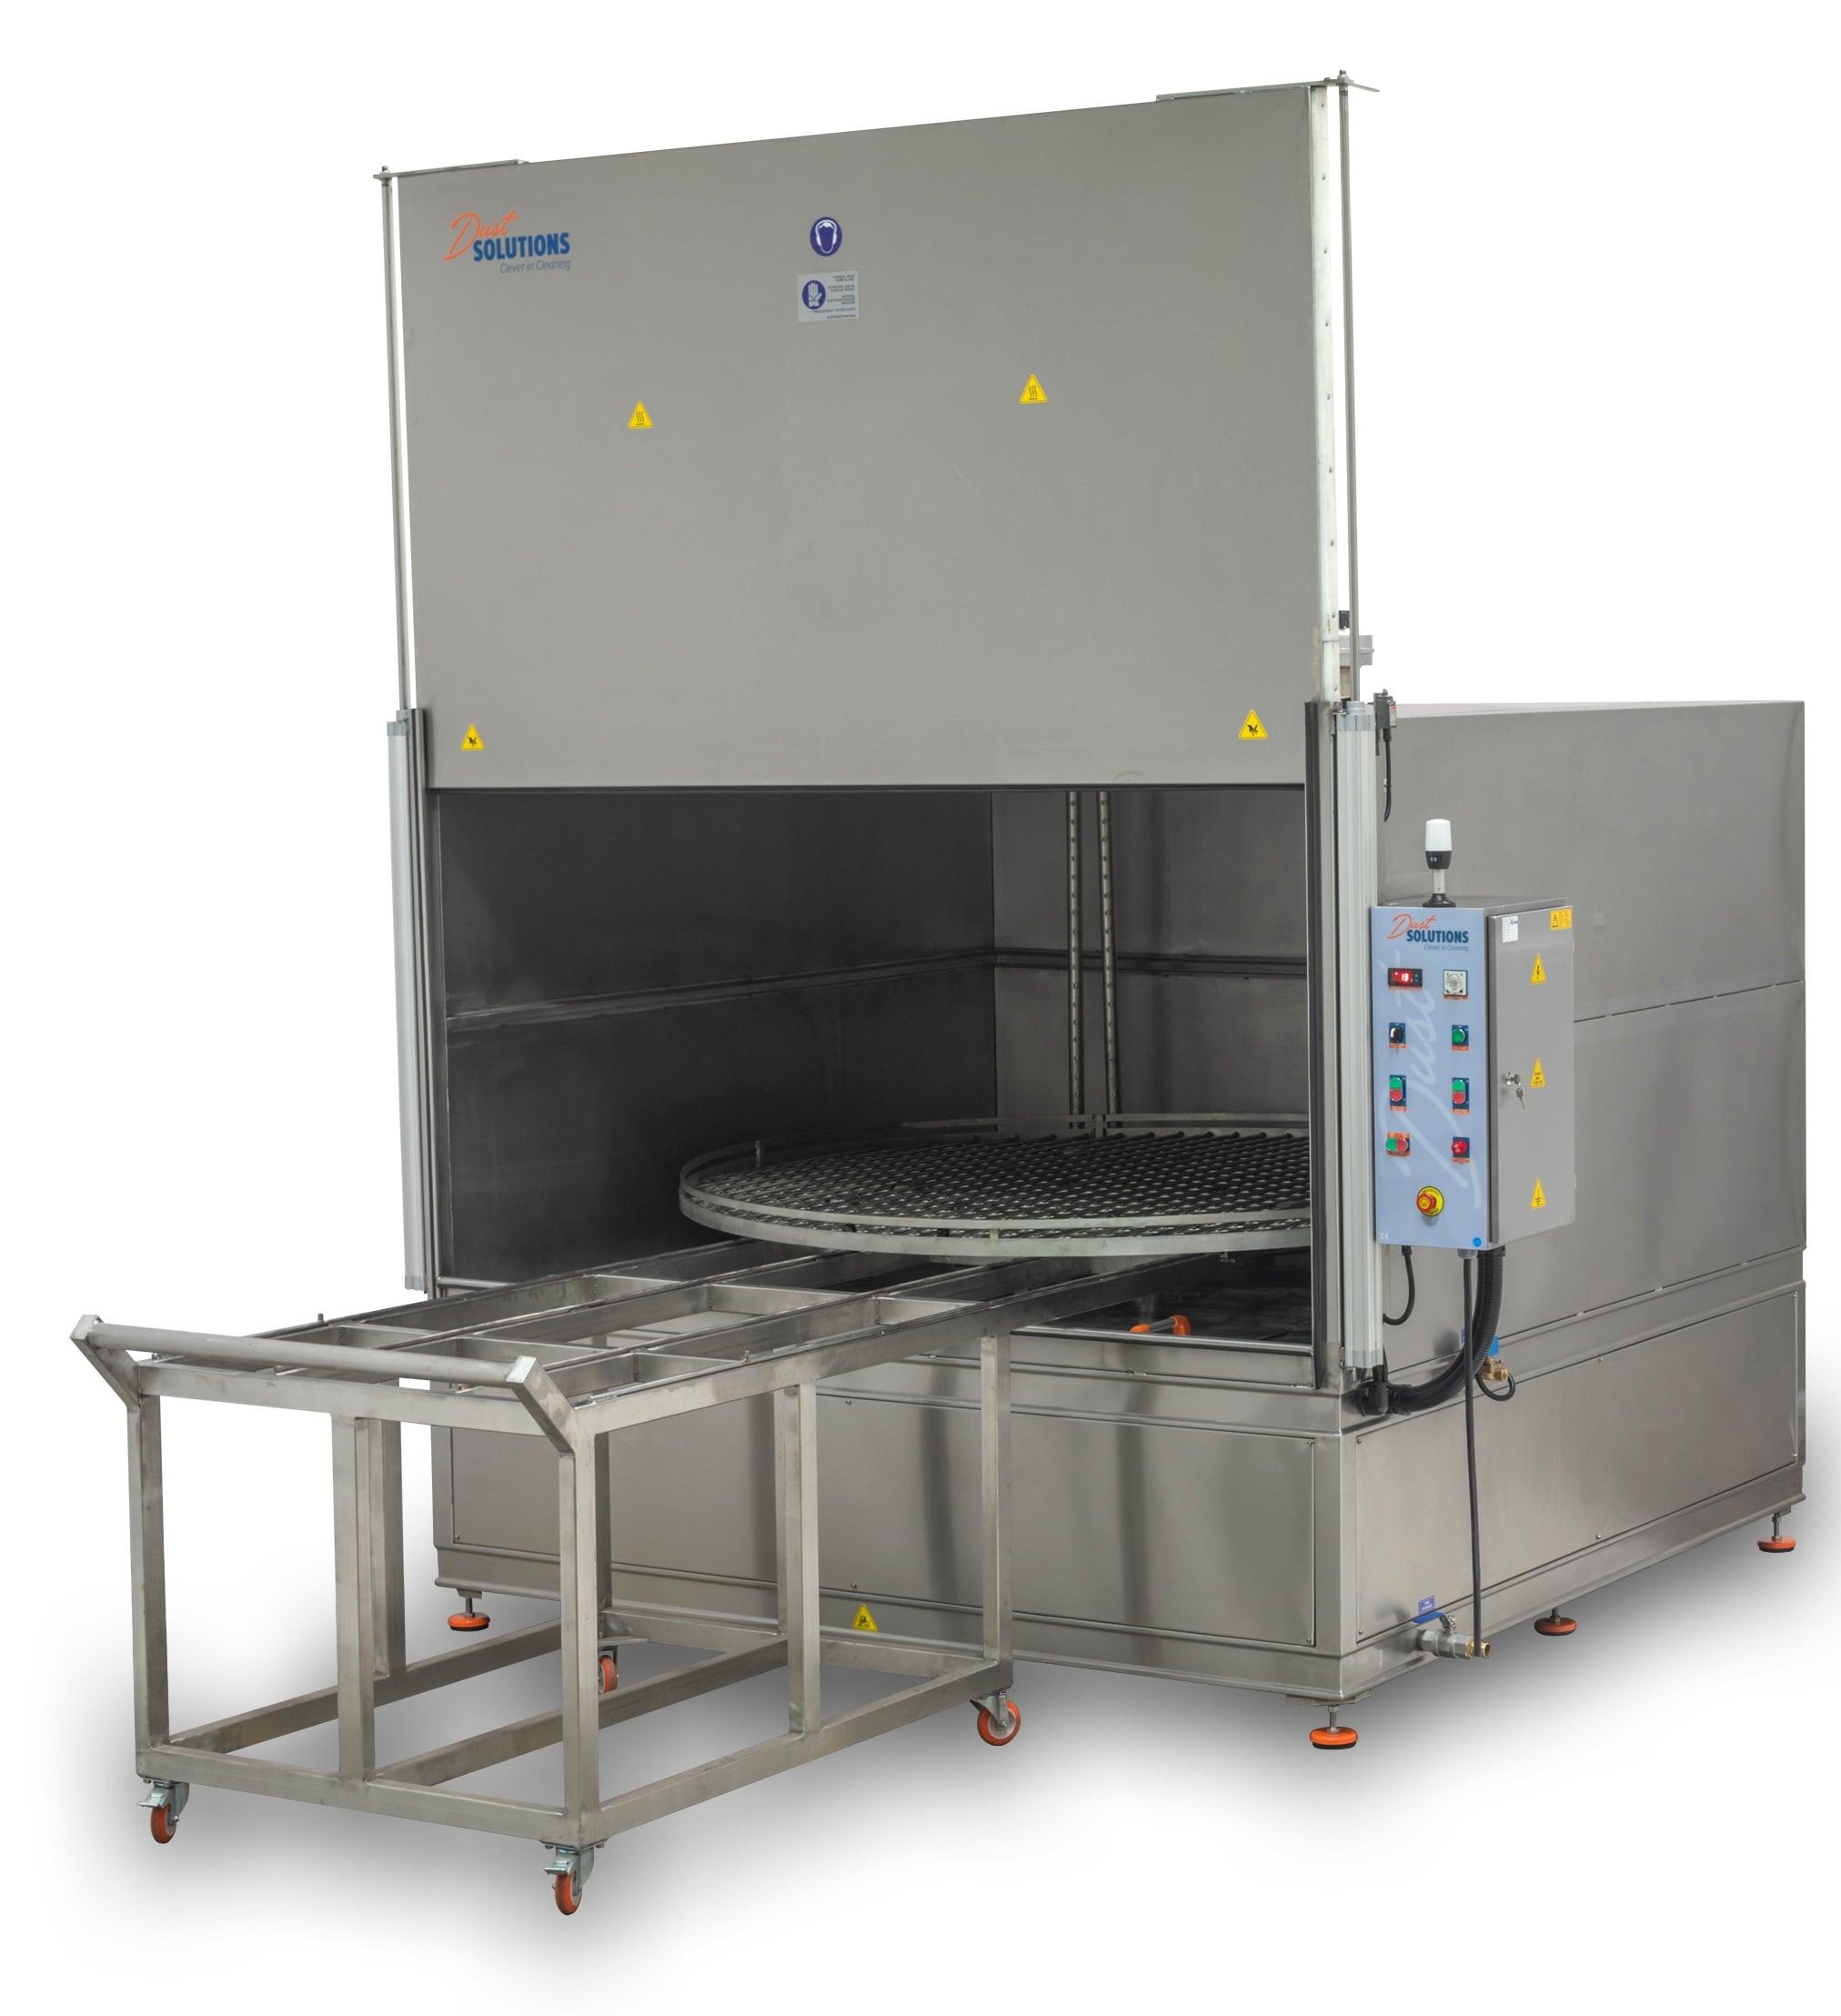 DS1750_Industriële reinigingsmachine